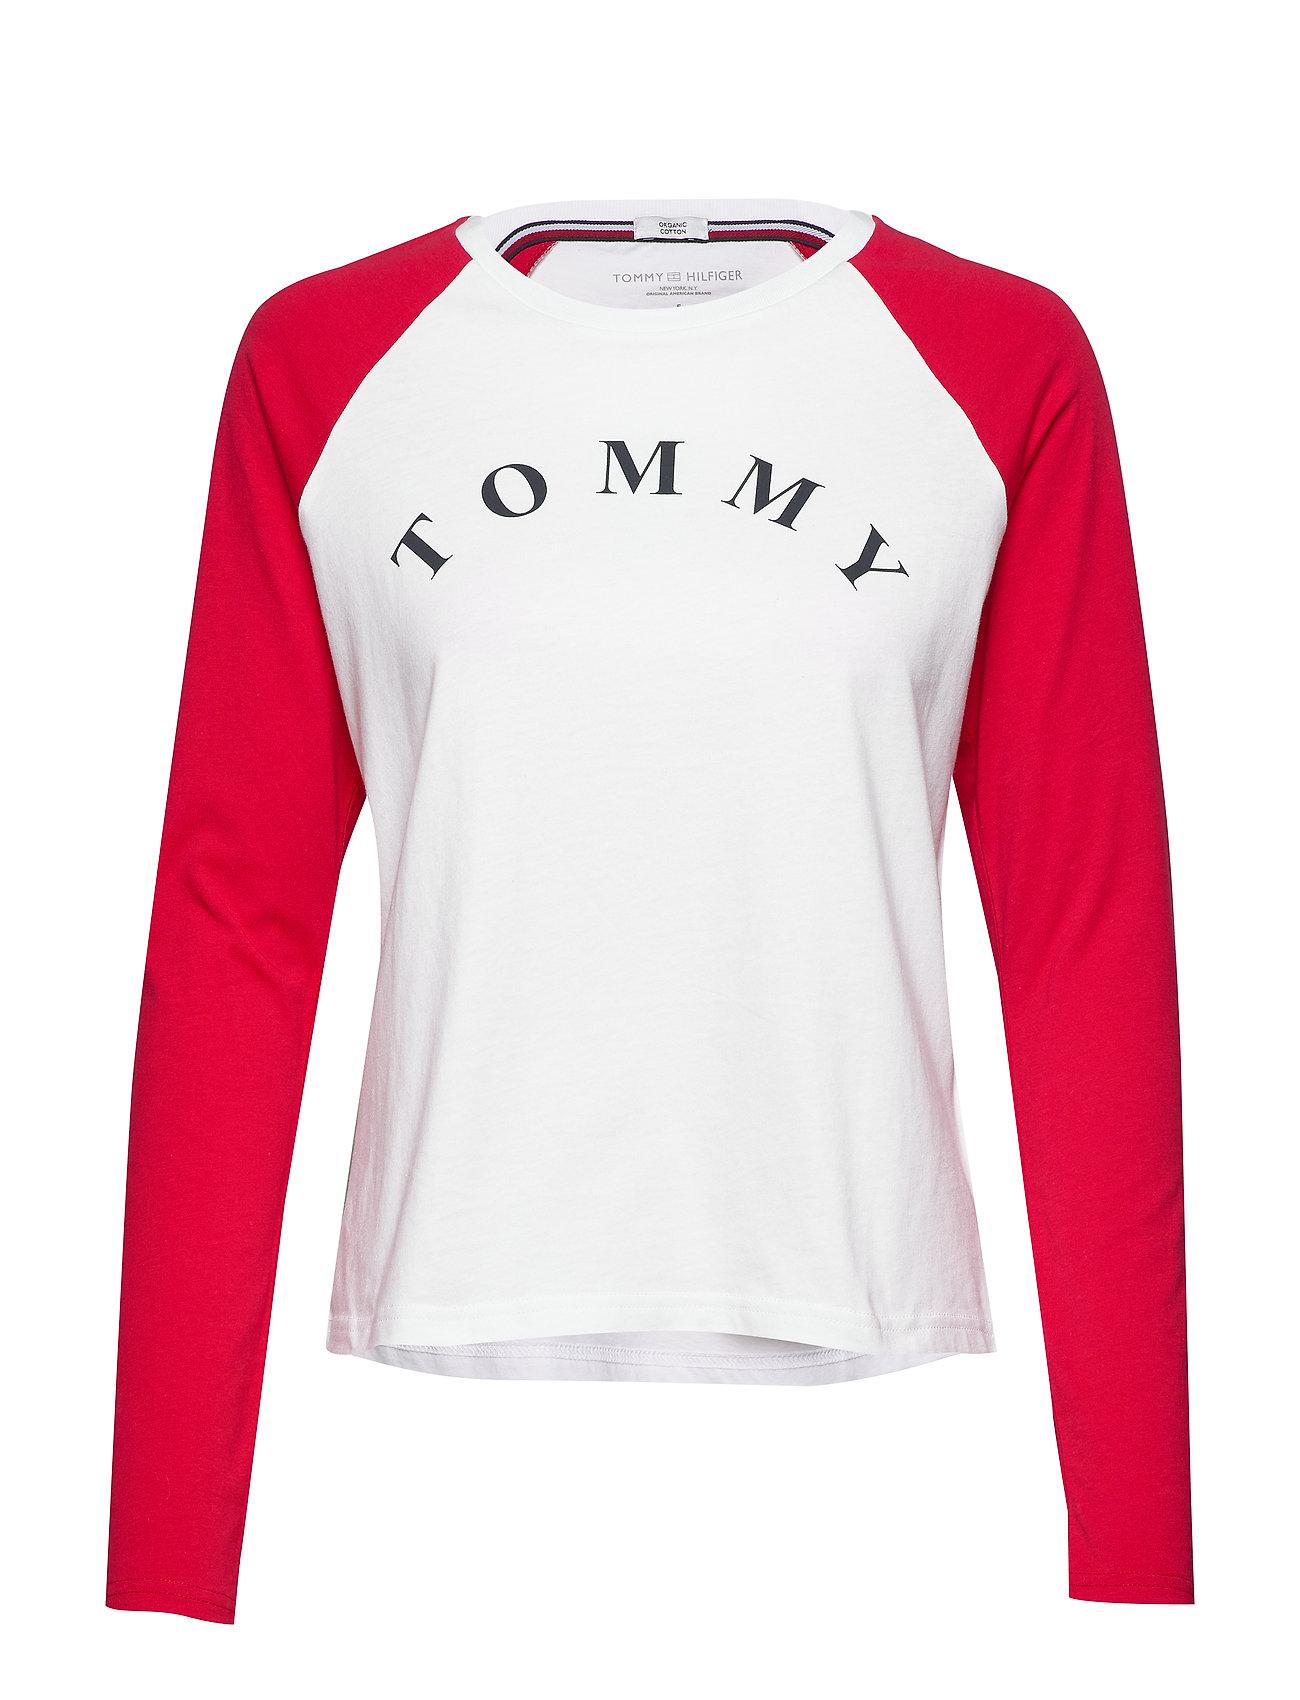 Tommy Hilfiger LS TEE SLOGAN - PVH CLASSIC WHITE